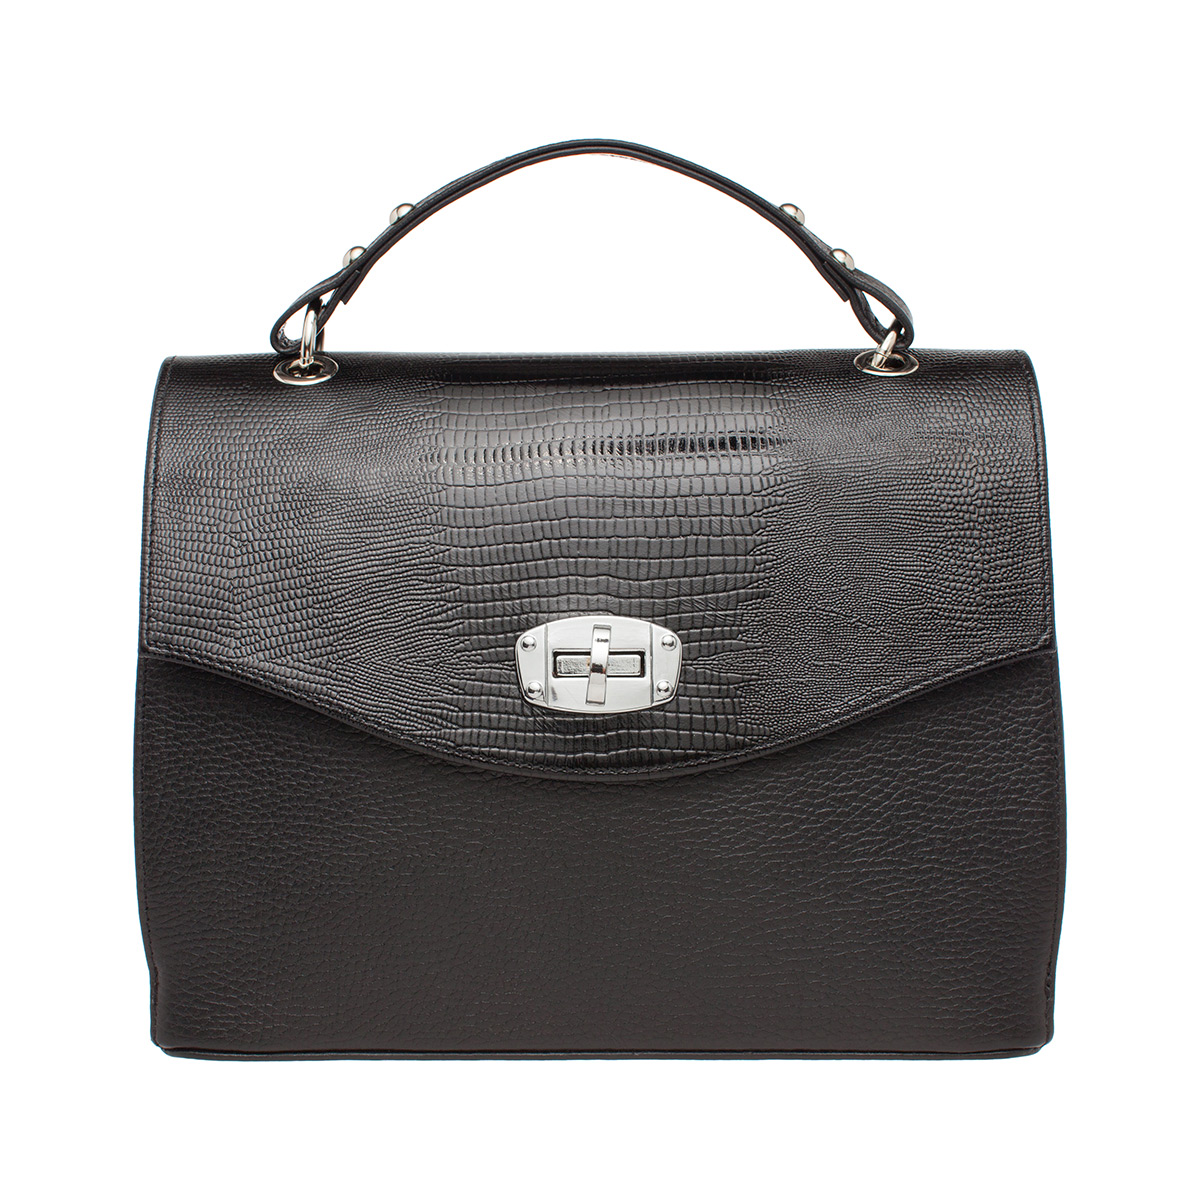 Женская сумка Alison Black фото